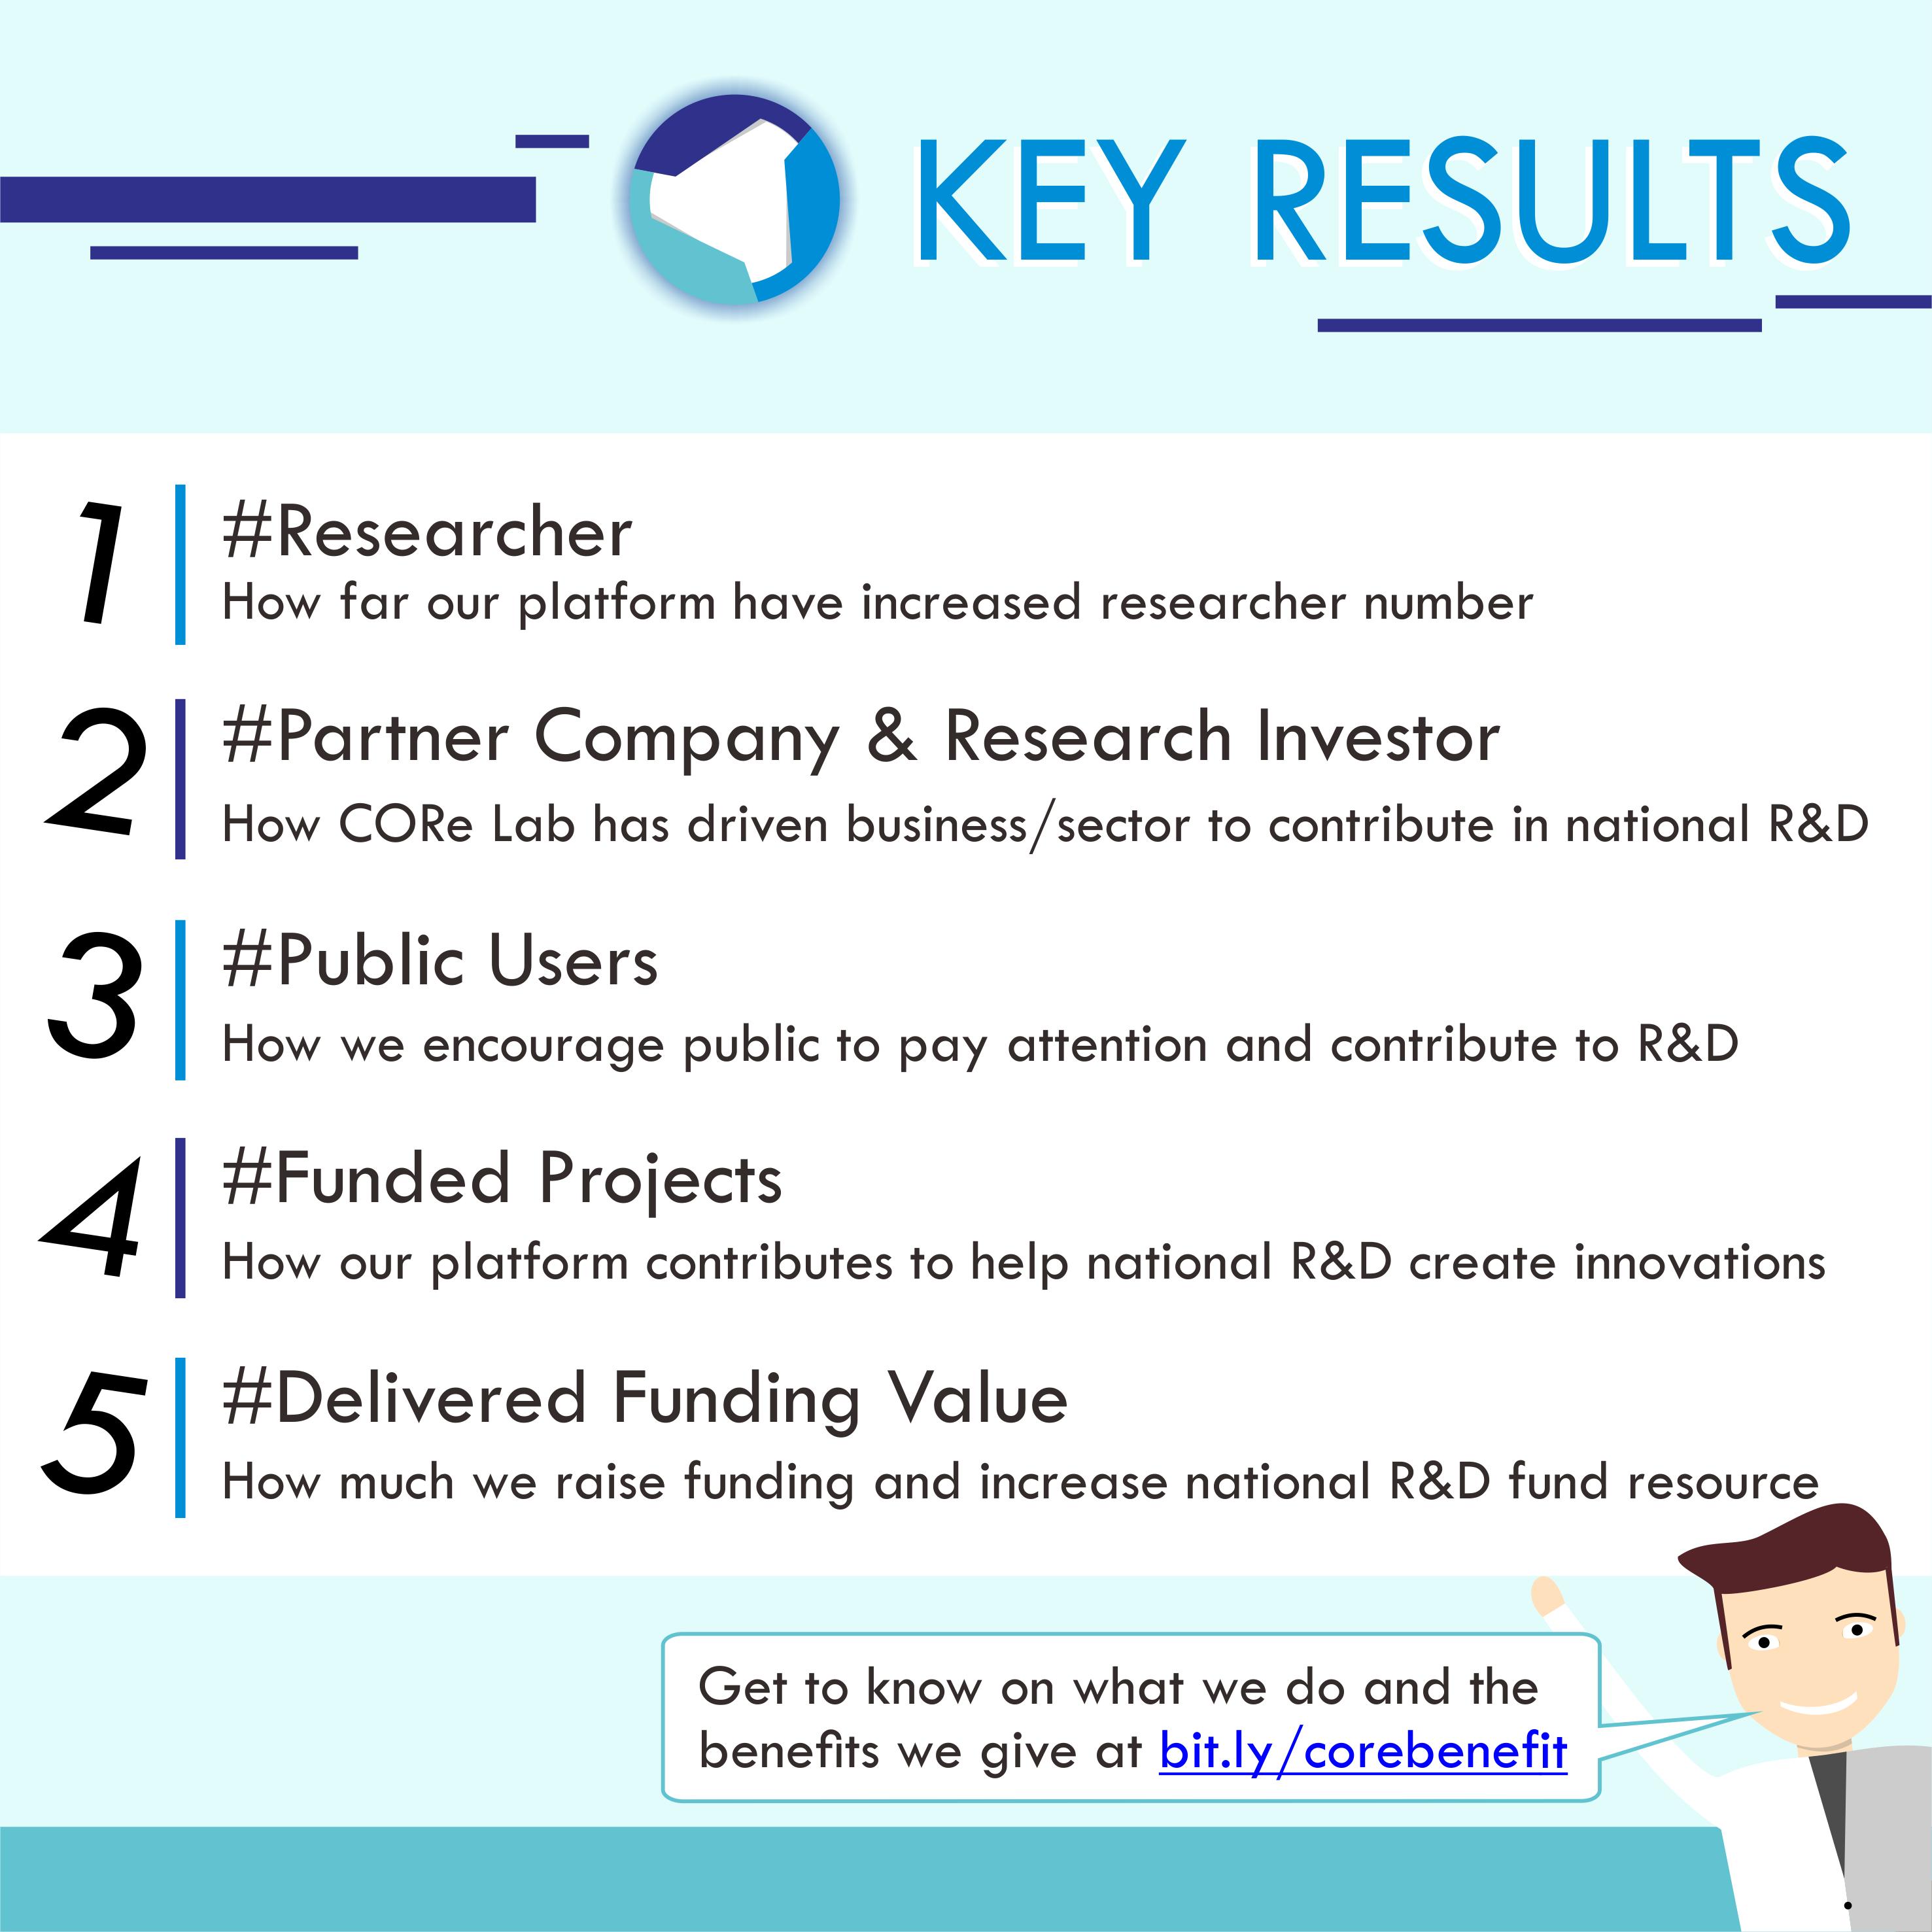 /srv/www/vhosts/user3101/html/entrepreneurship-campus.org/wp-content/uploads/2019/05/Key-Results-2.png